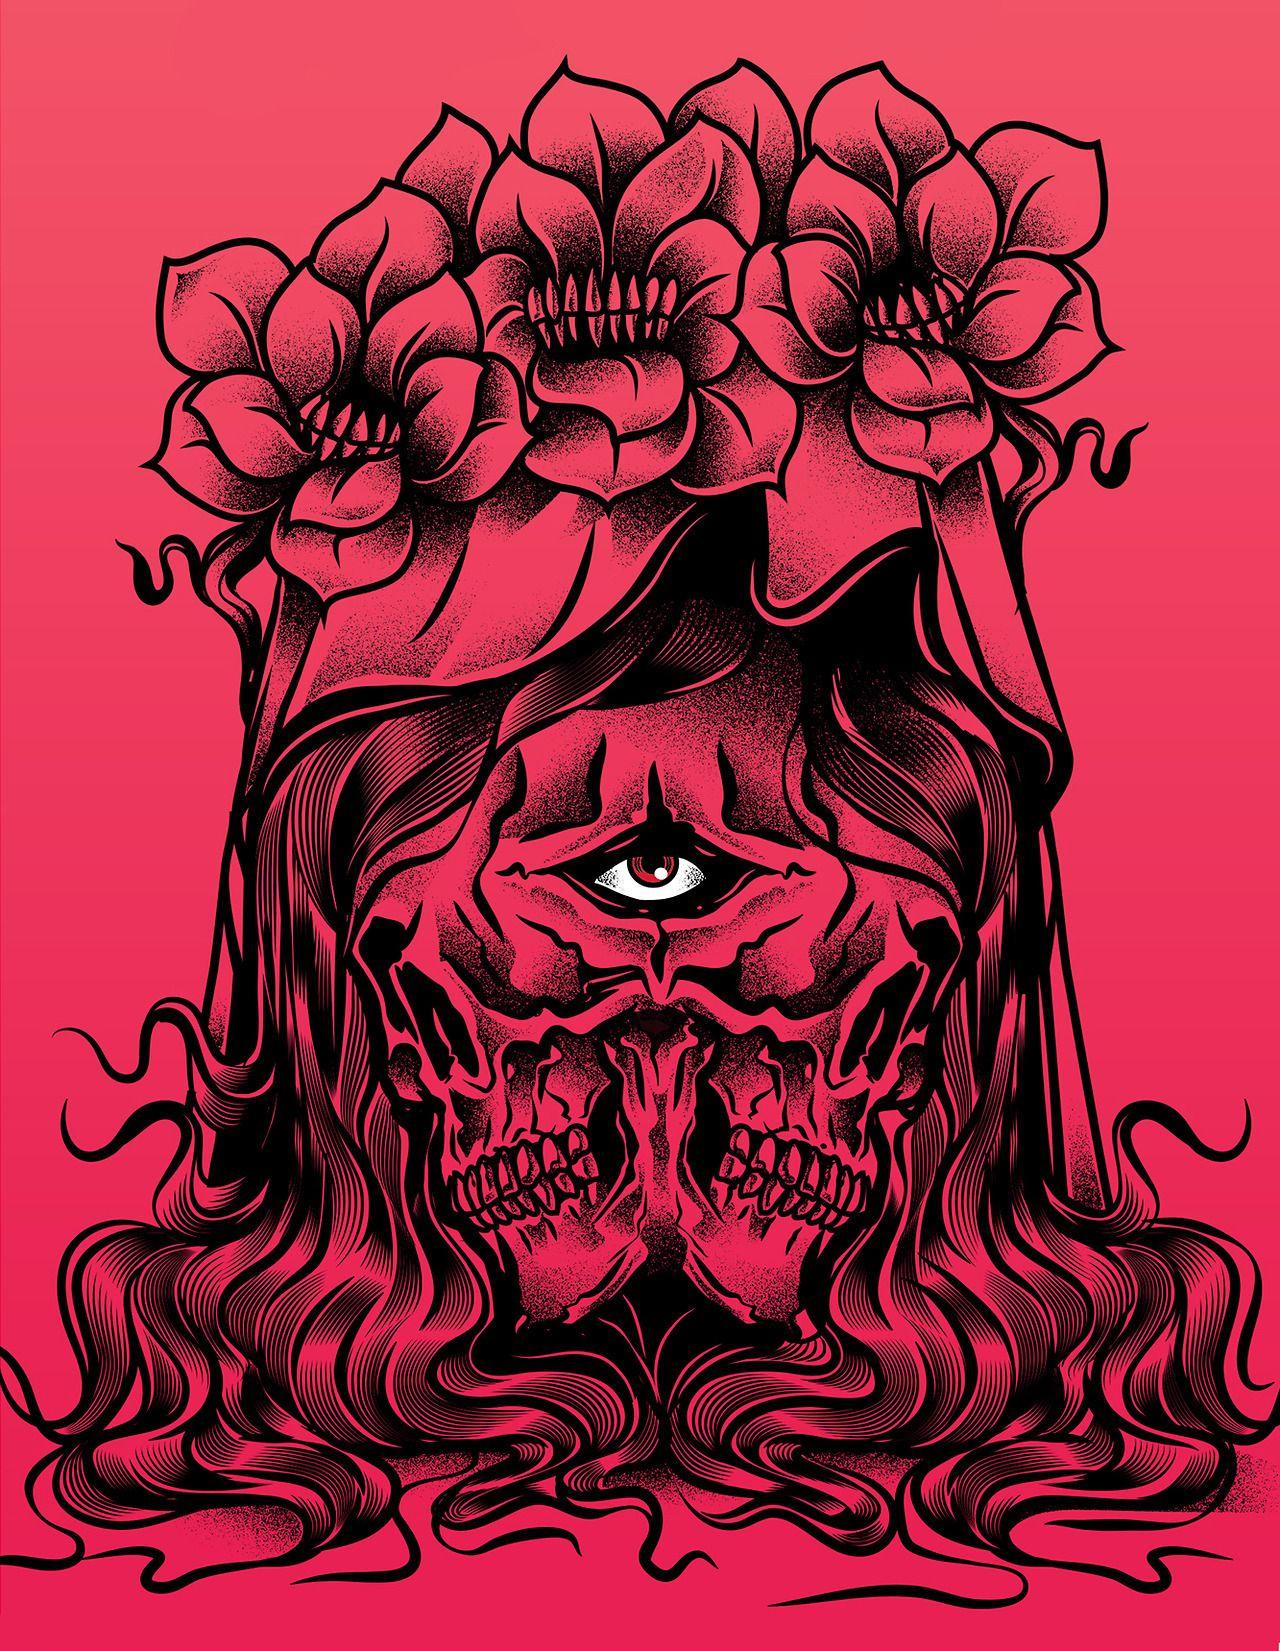 Manuel Cetina Inside Your Face Brand Identity Design Poster